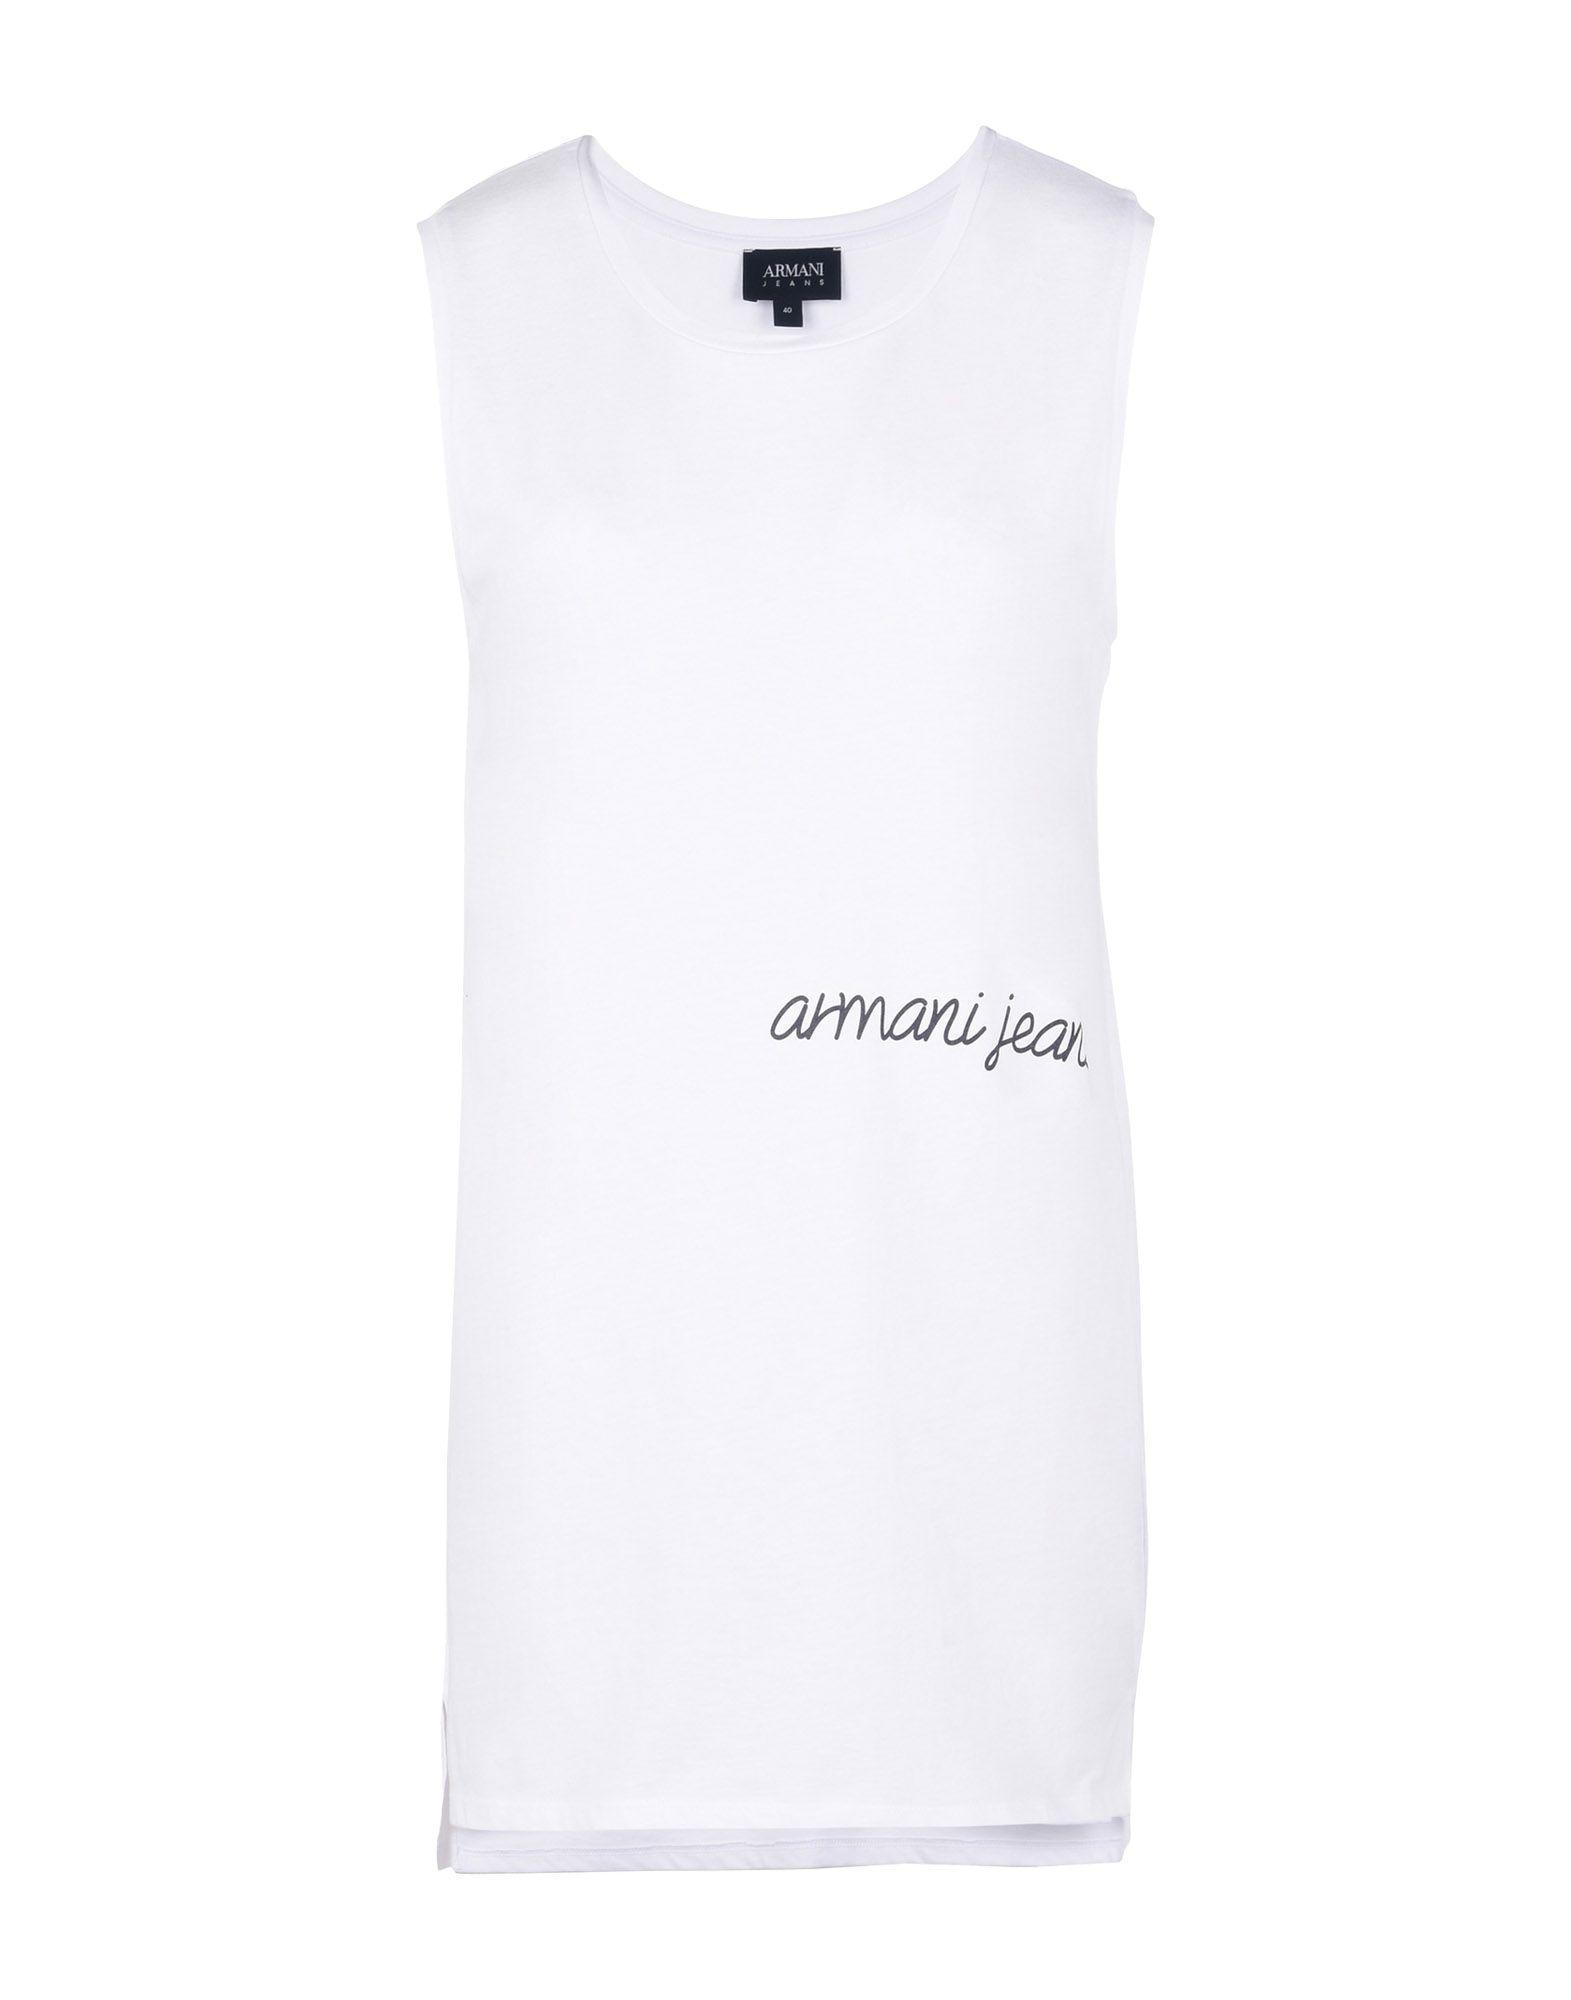 ARMANI JEANS Футболка armani jeans шорты женские